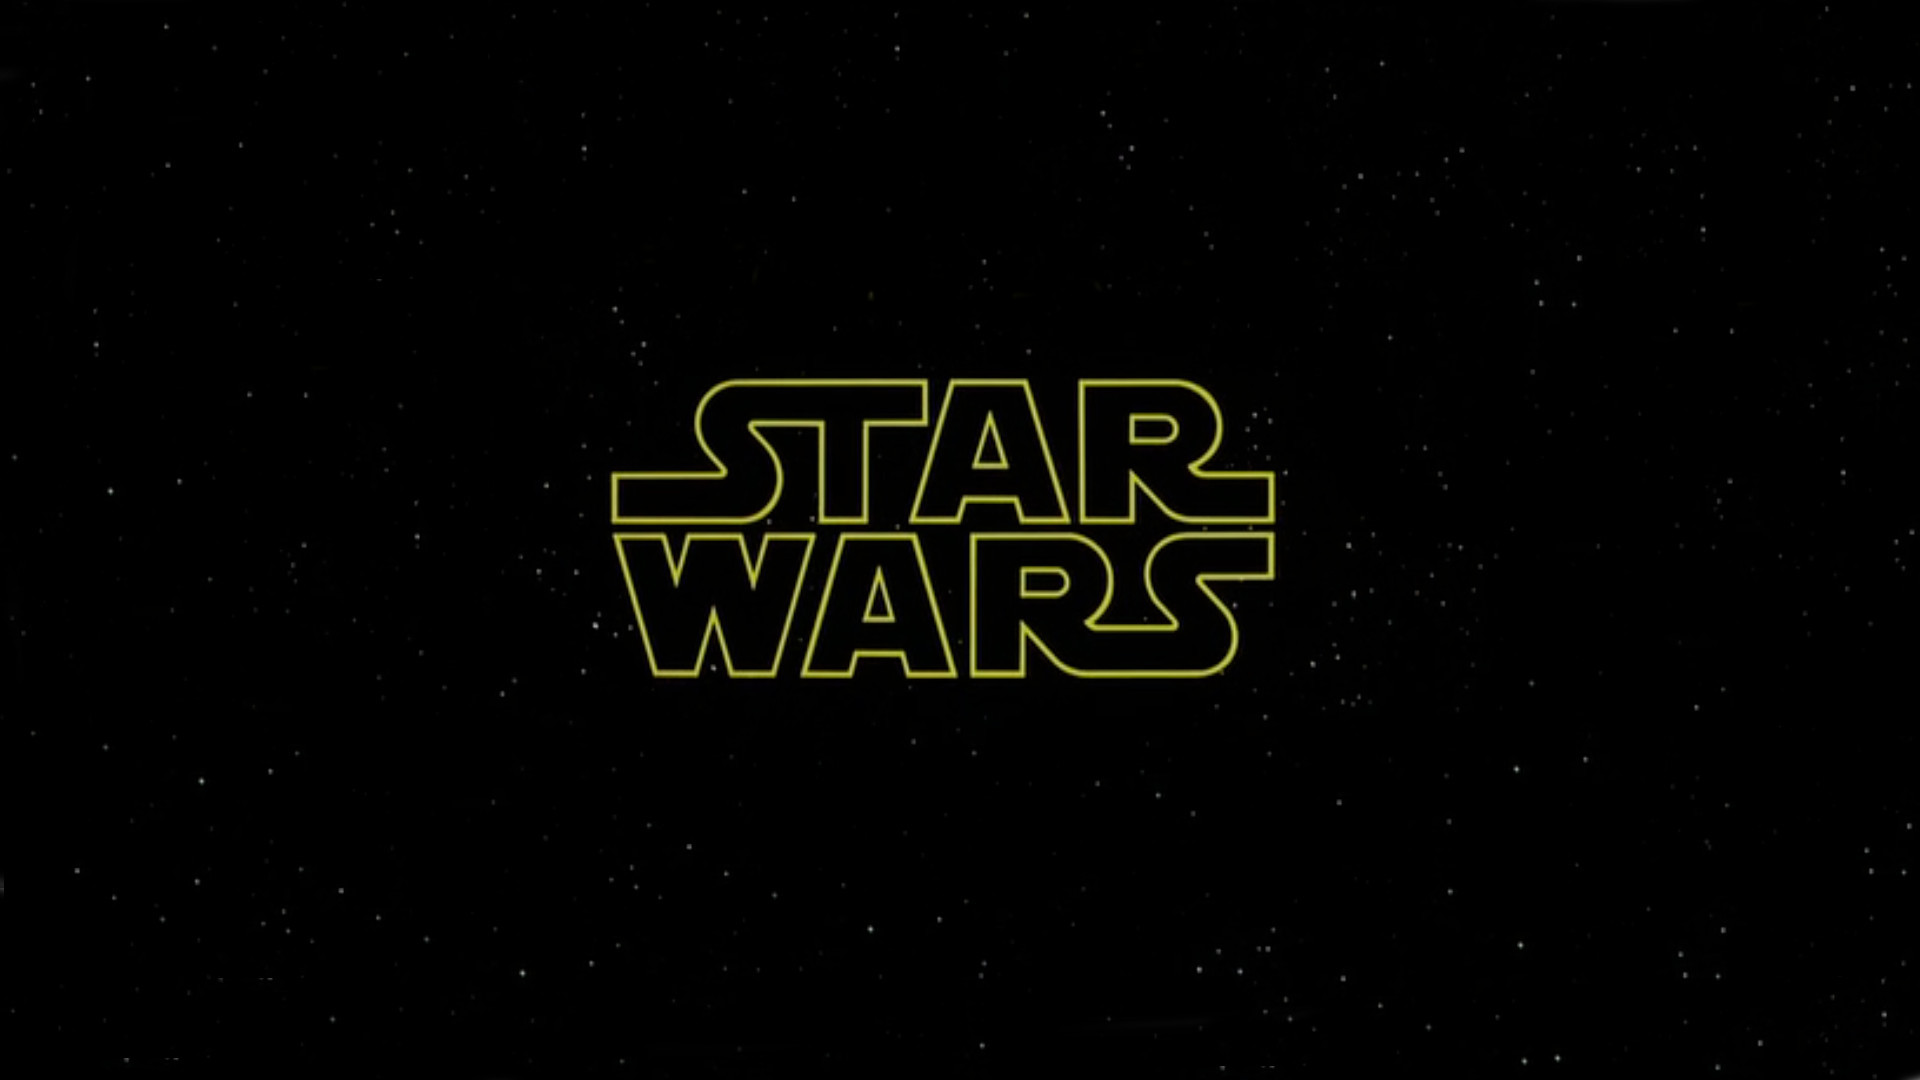 1920x1080 star wars wallpaper 72 images